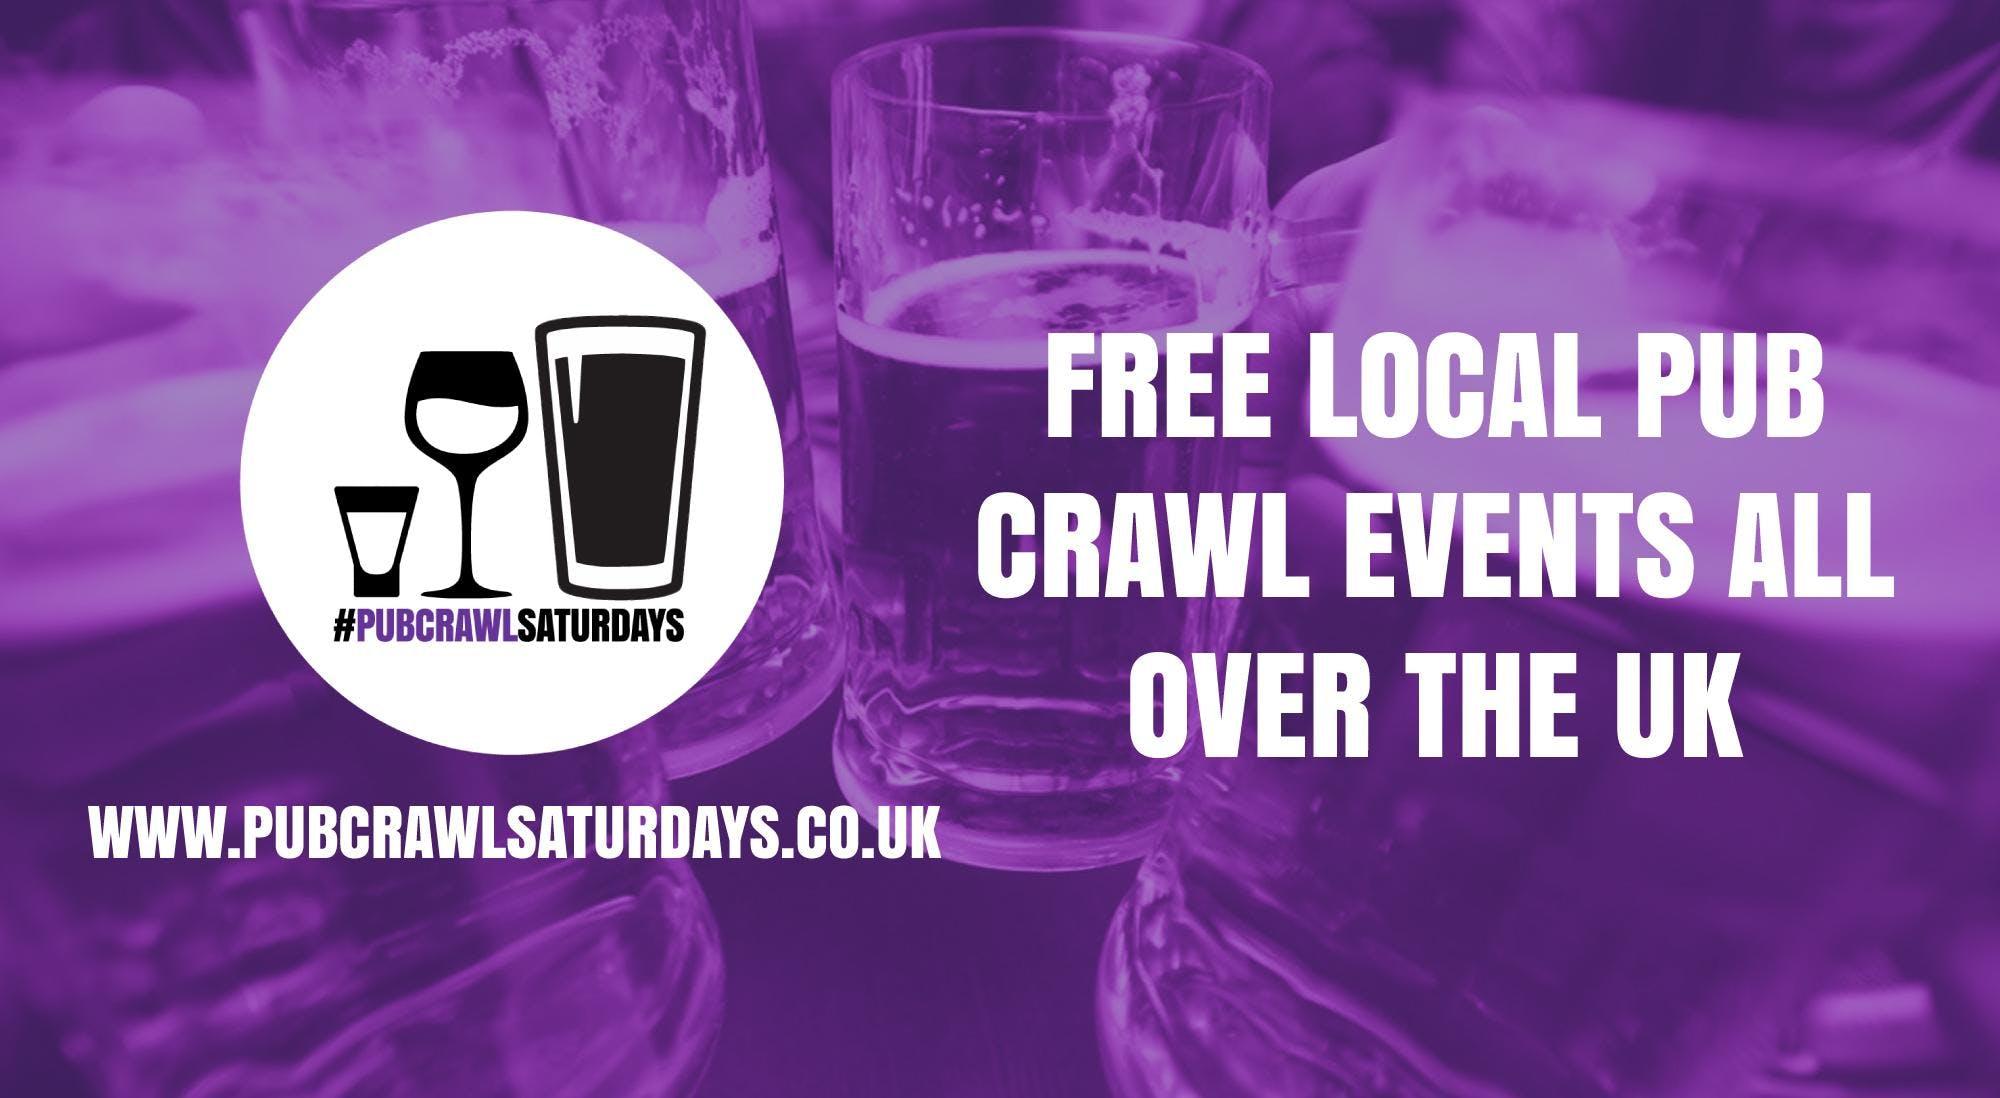 PUB CRAWL SATURDAYS! Free weekly pub crawl event in Paisley